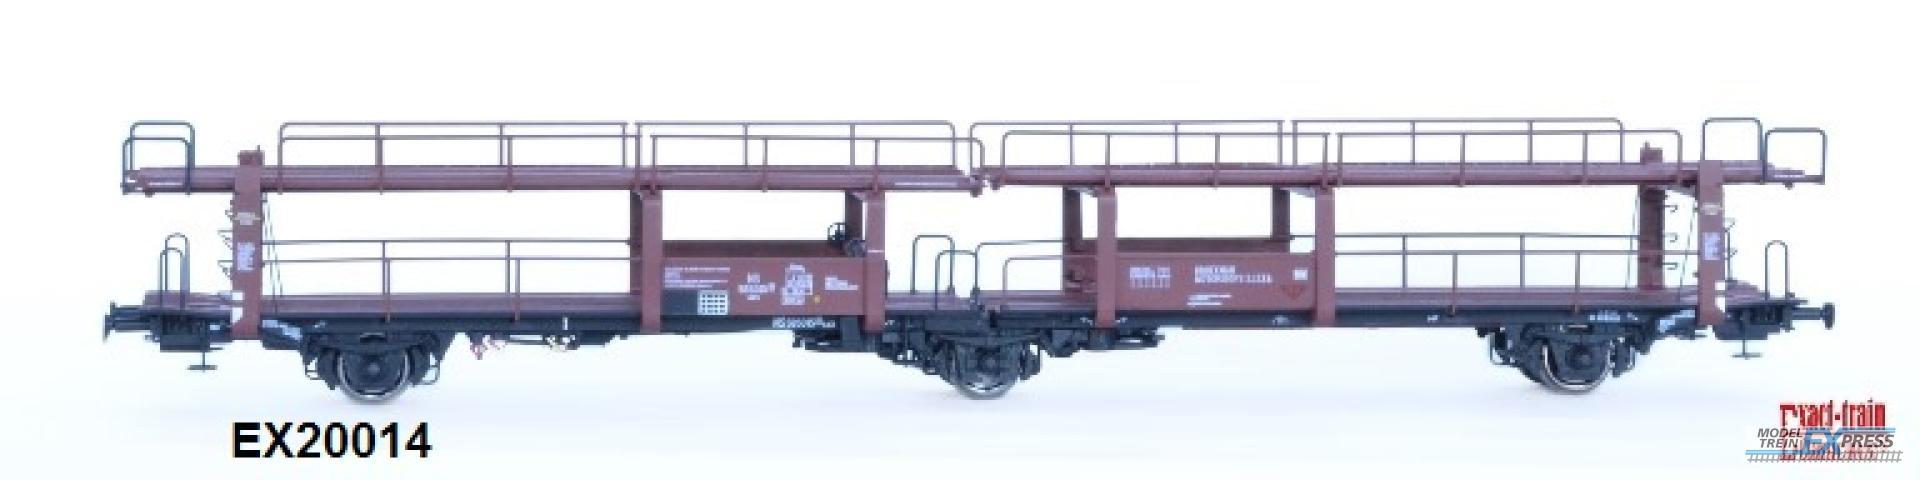 Exact-train 20552